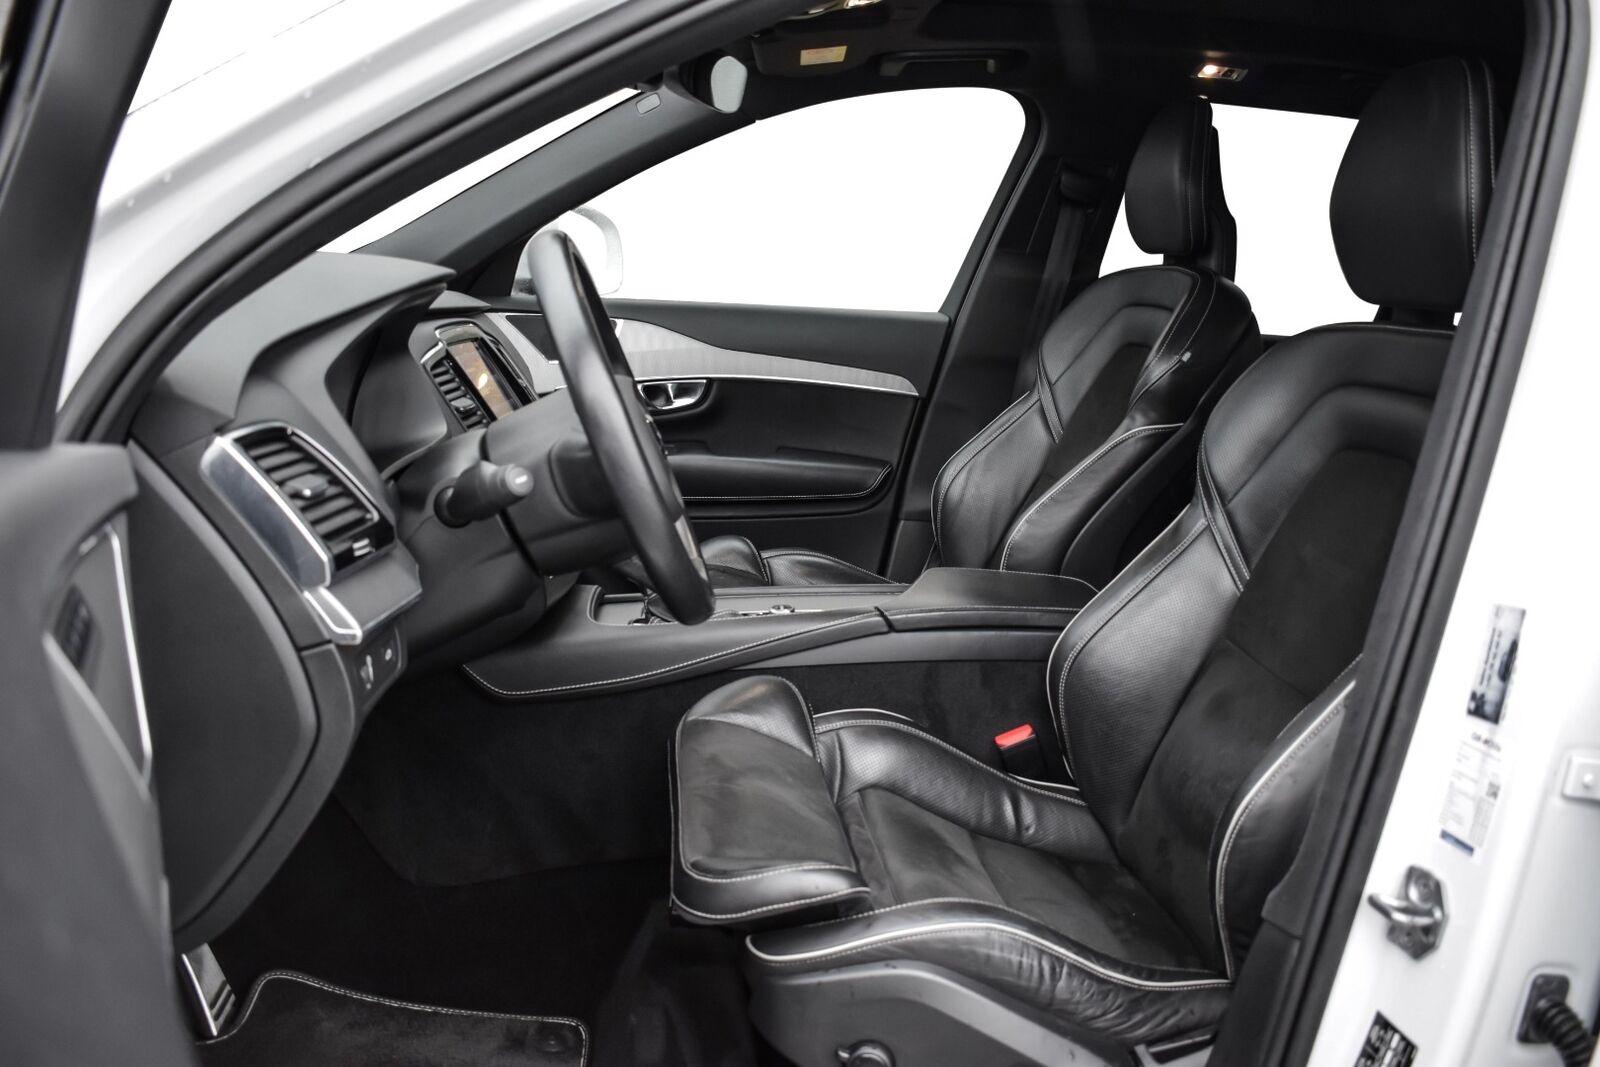 Volvo XC90 2,0 D5 225 R-Design aut. AWD 7prs - billede 6